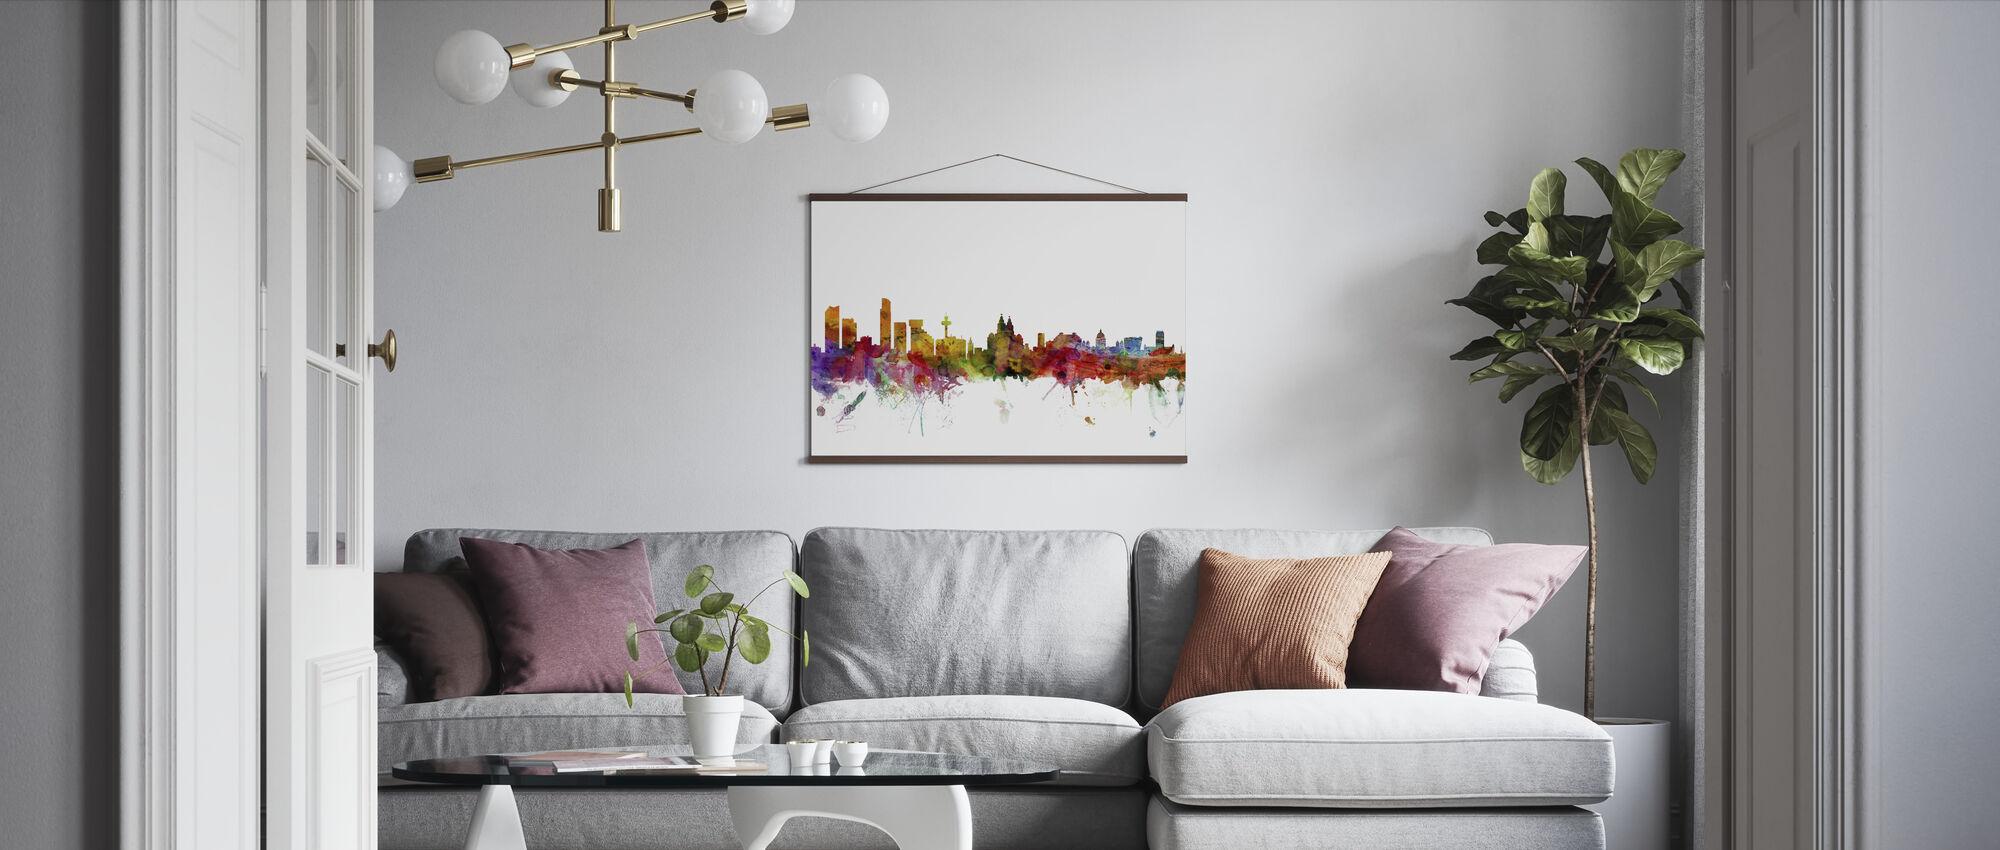 Liverpool Skyline - Plakat - Stue